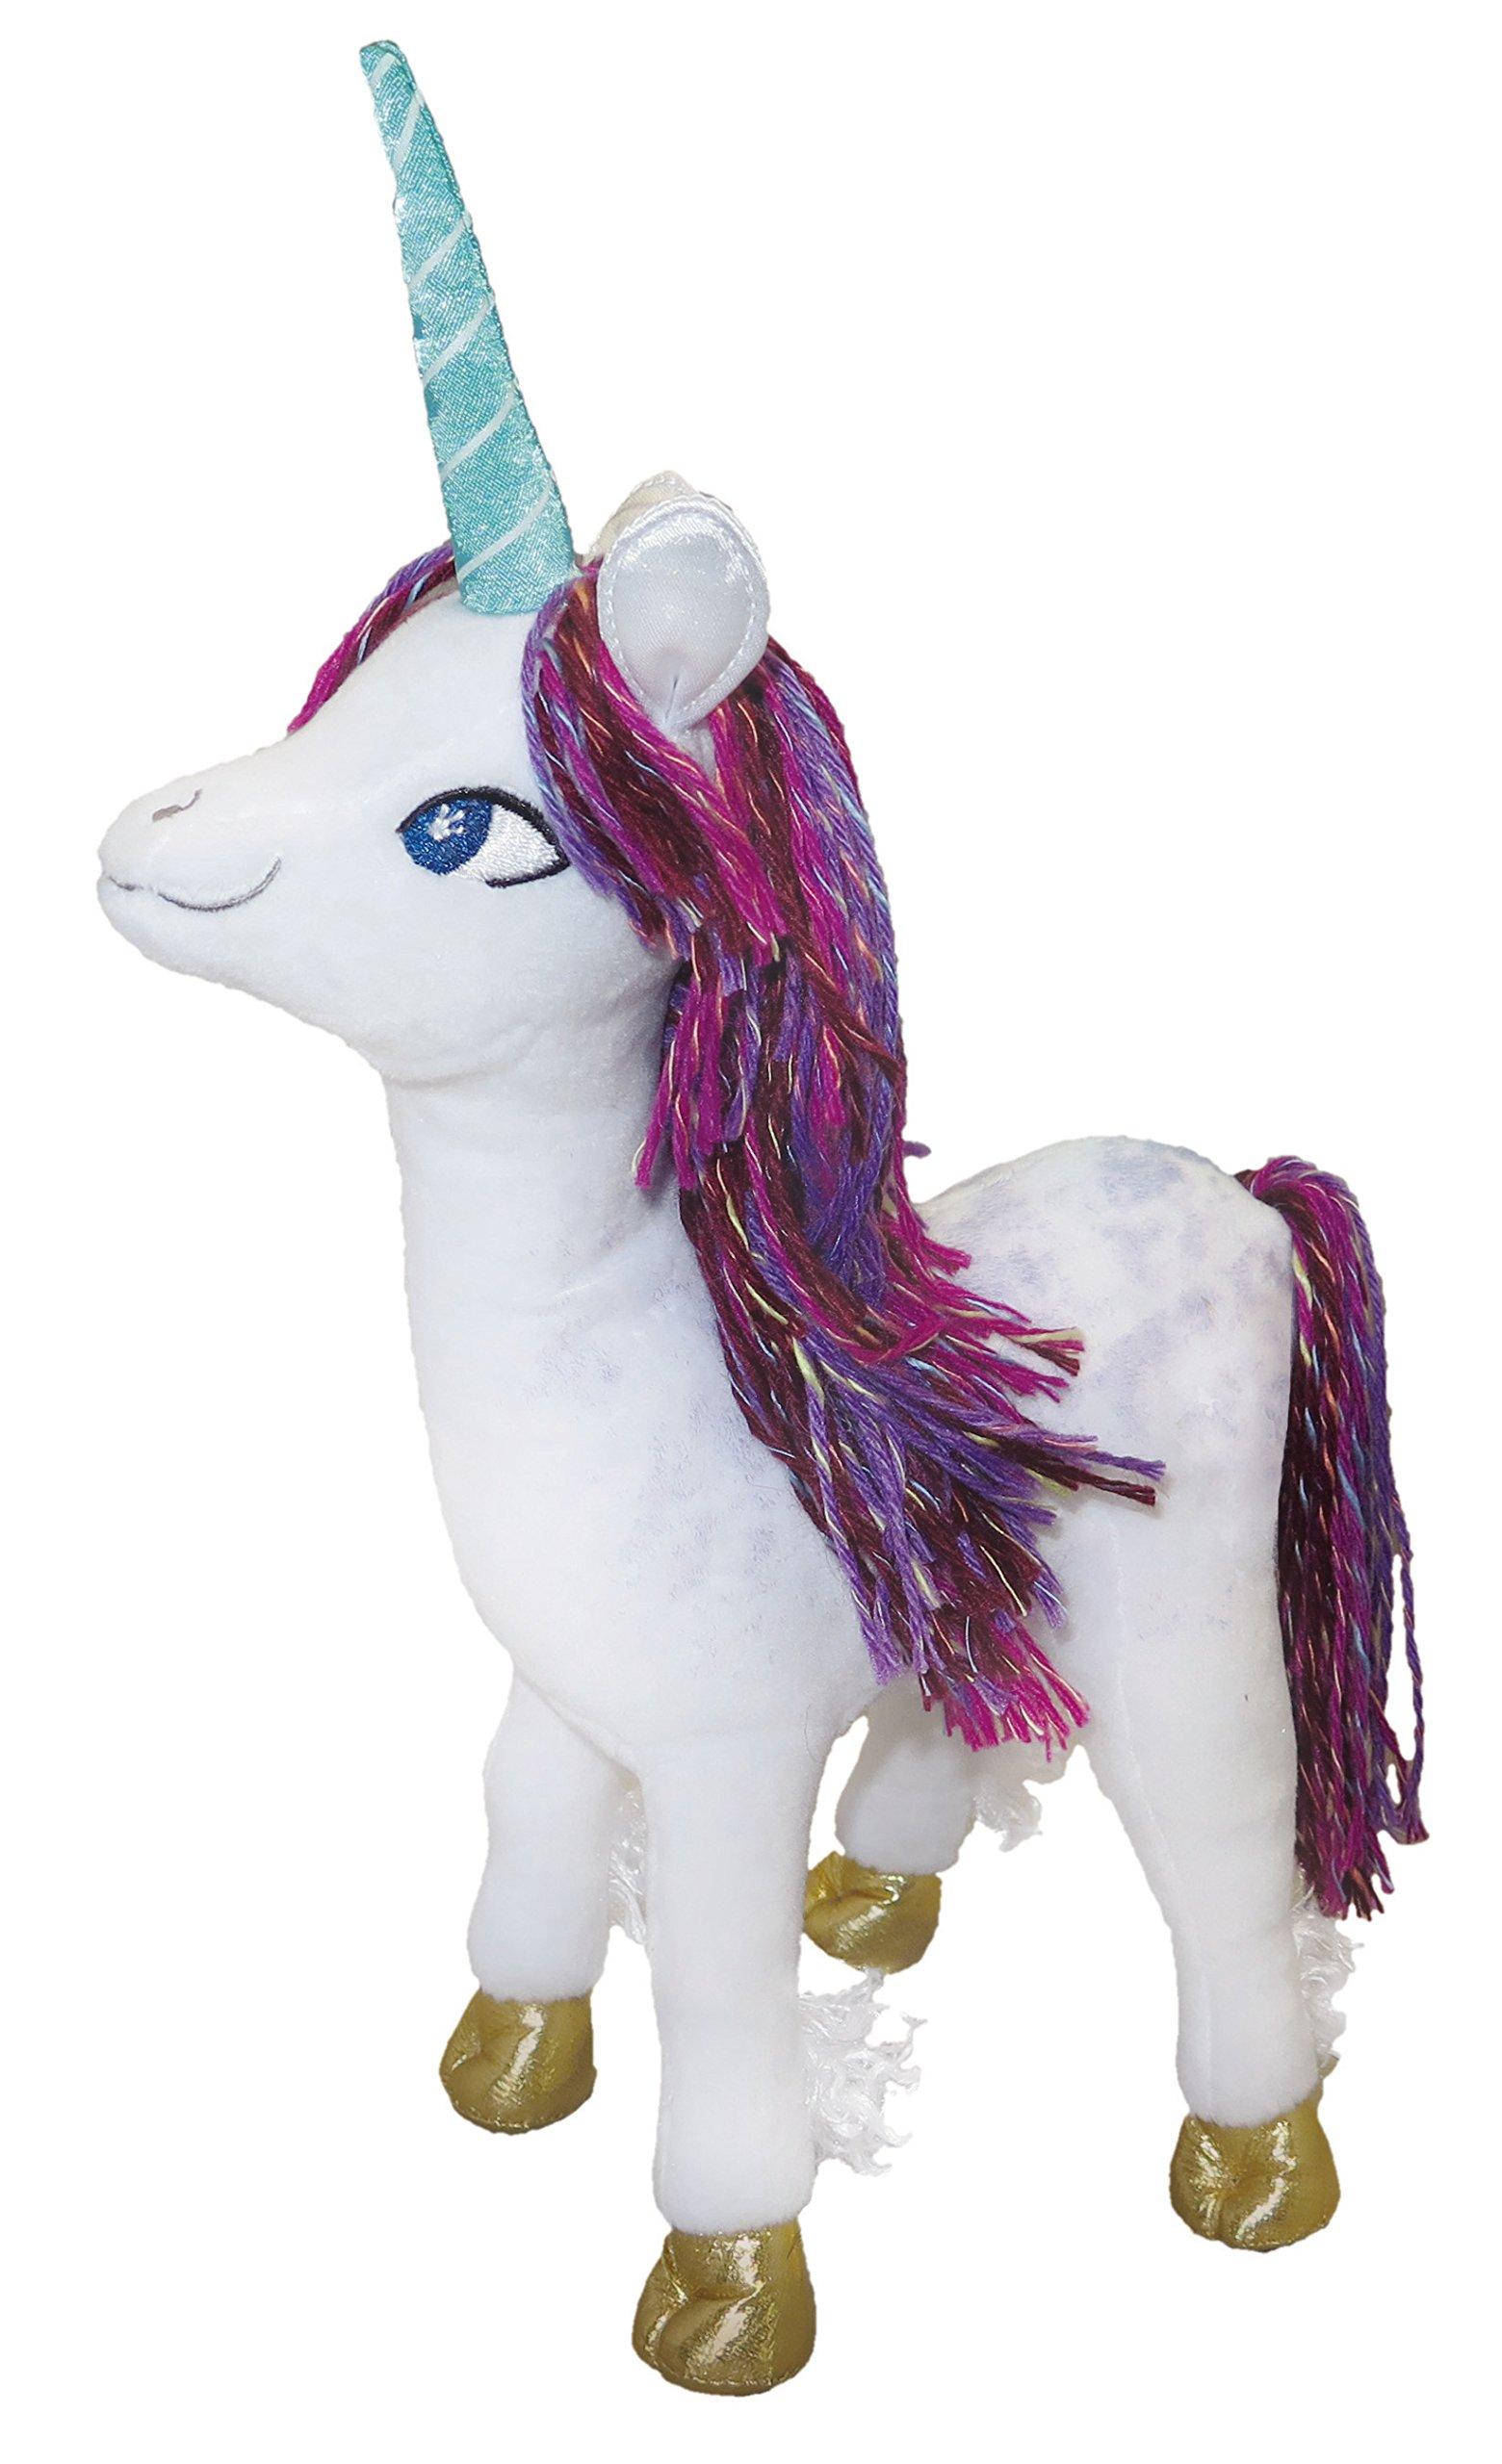 MerryMakers Uni The Unicorn Doll, 12.5-Inch